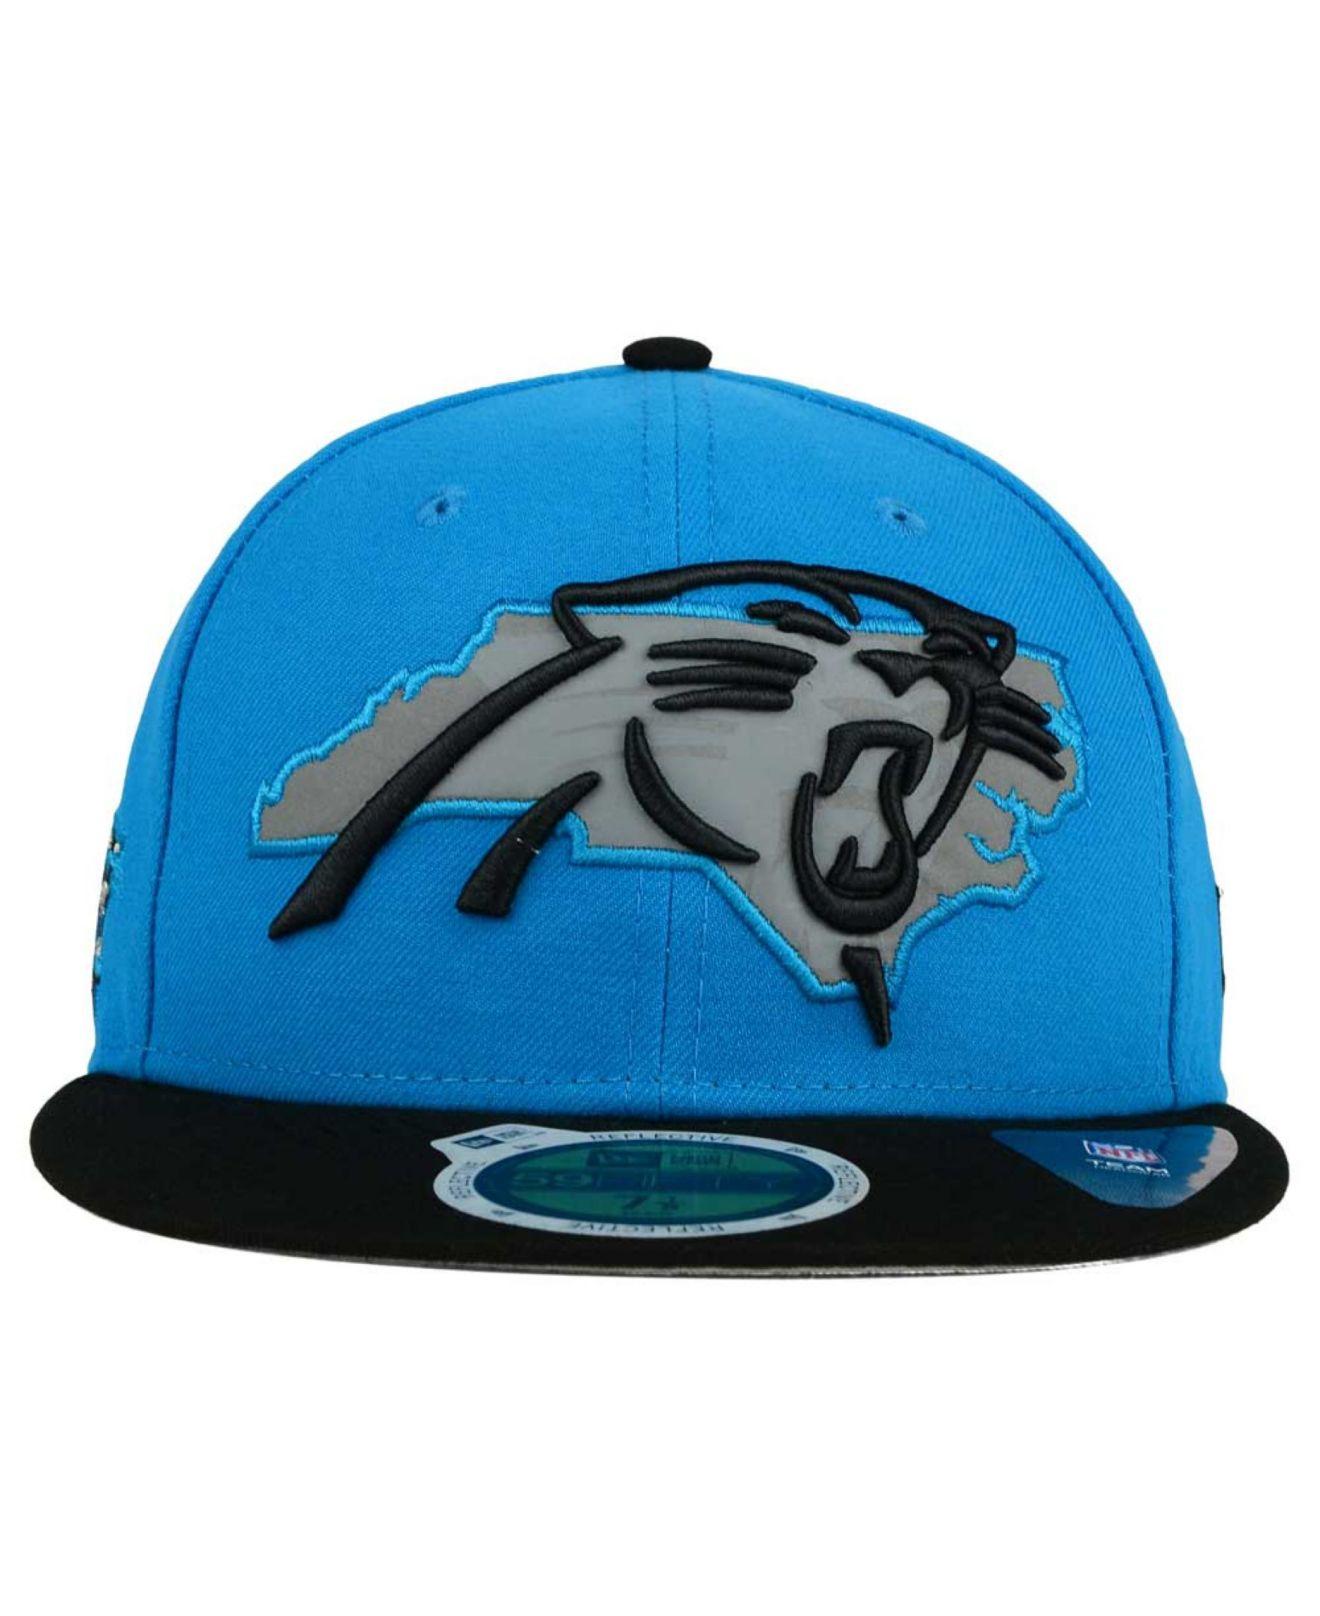 Lyst - KTZ Carolina Panthers State Flective Redux 59fifty Cap in ... 4cbd3b8b7